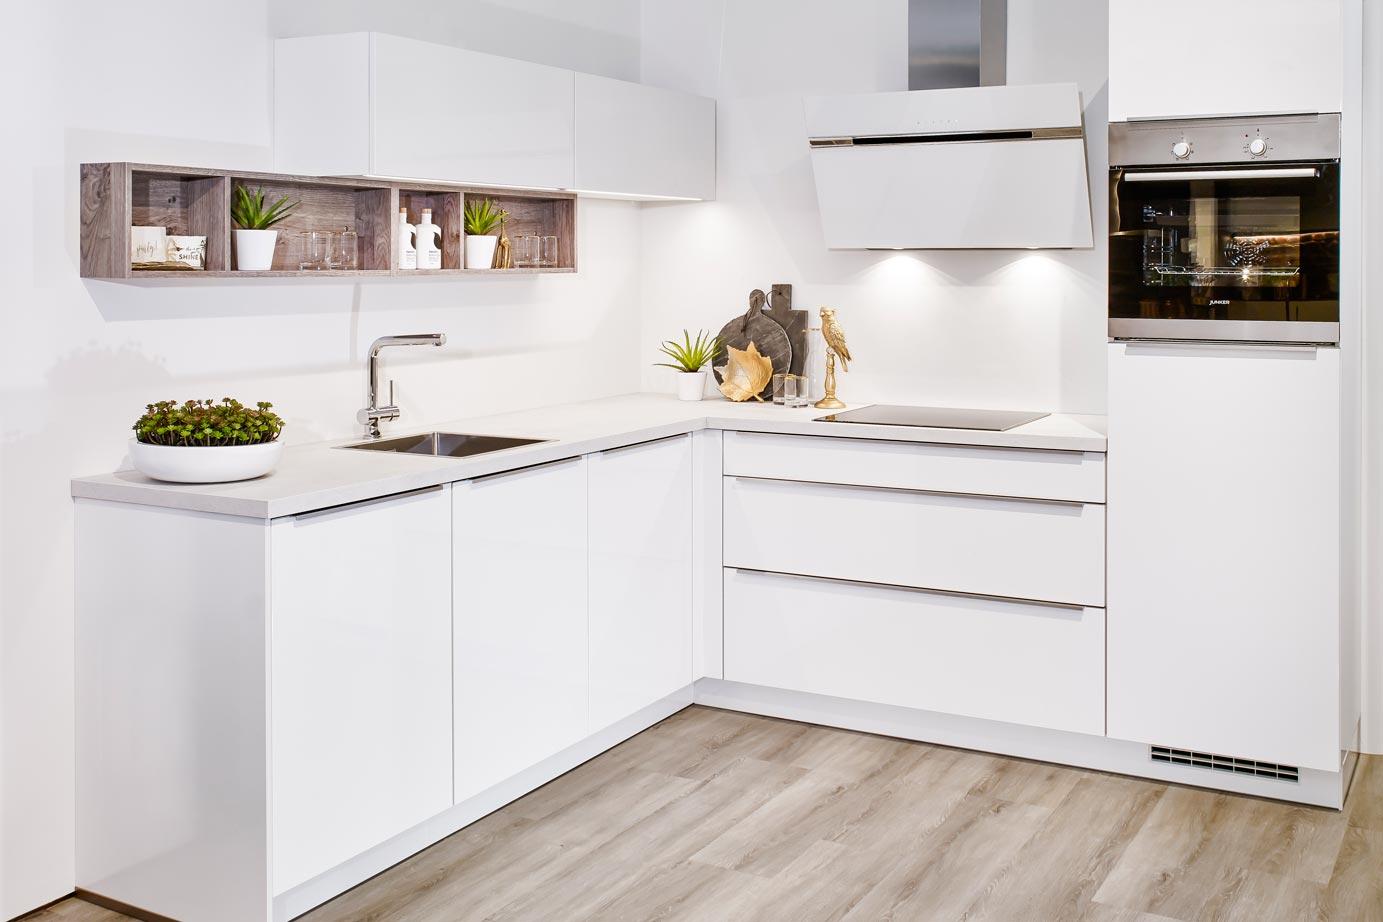 Keuken Kleine Kleur : Kleine keuken in moderne greeploze stijl bekijk foto s db keukens